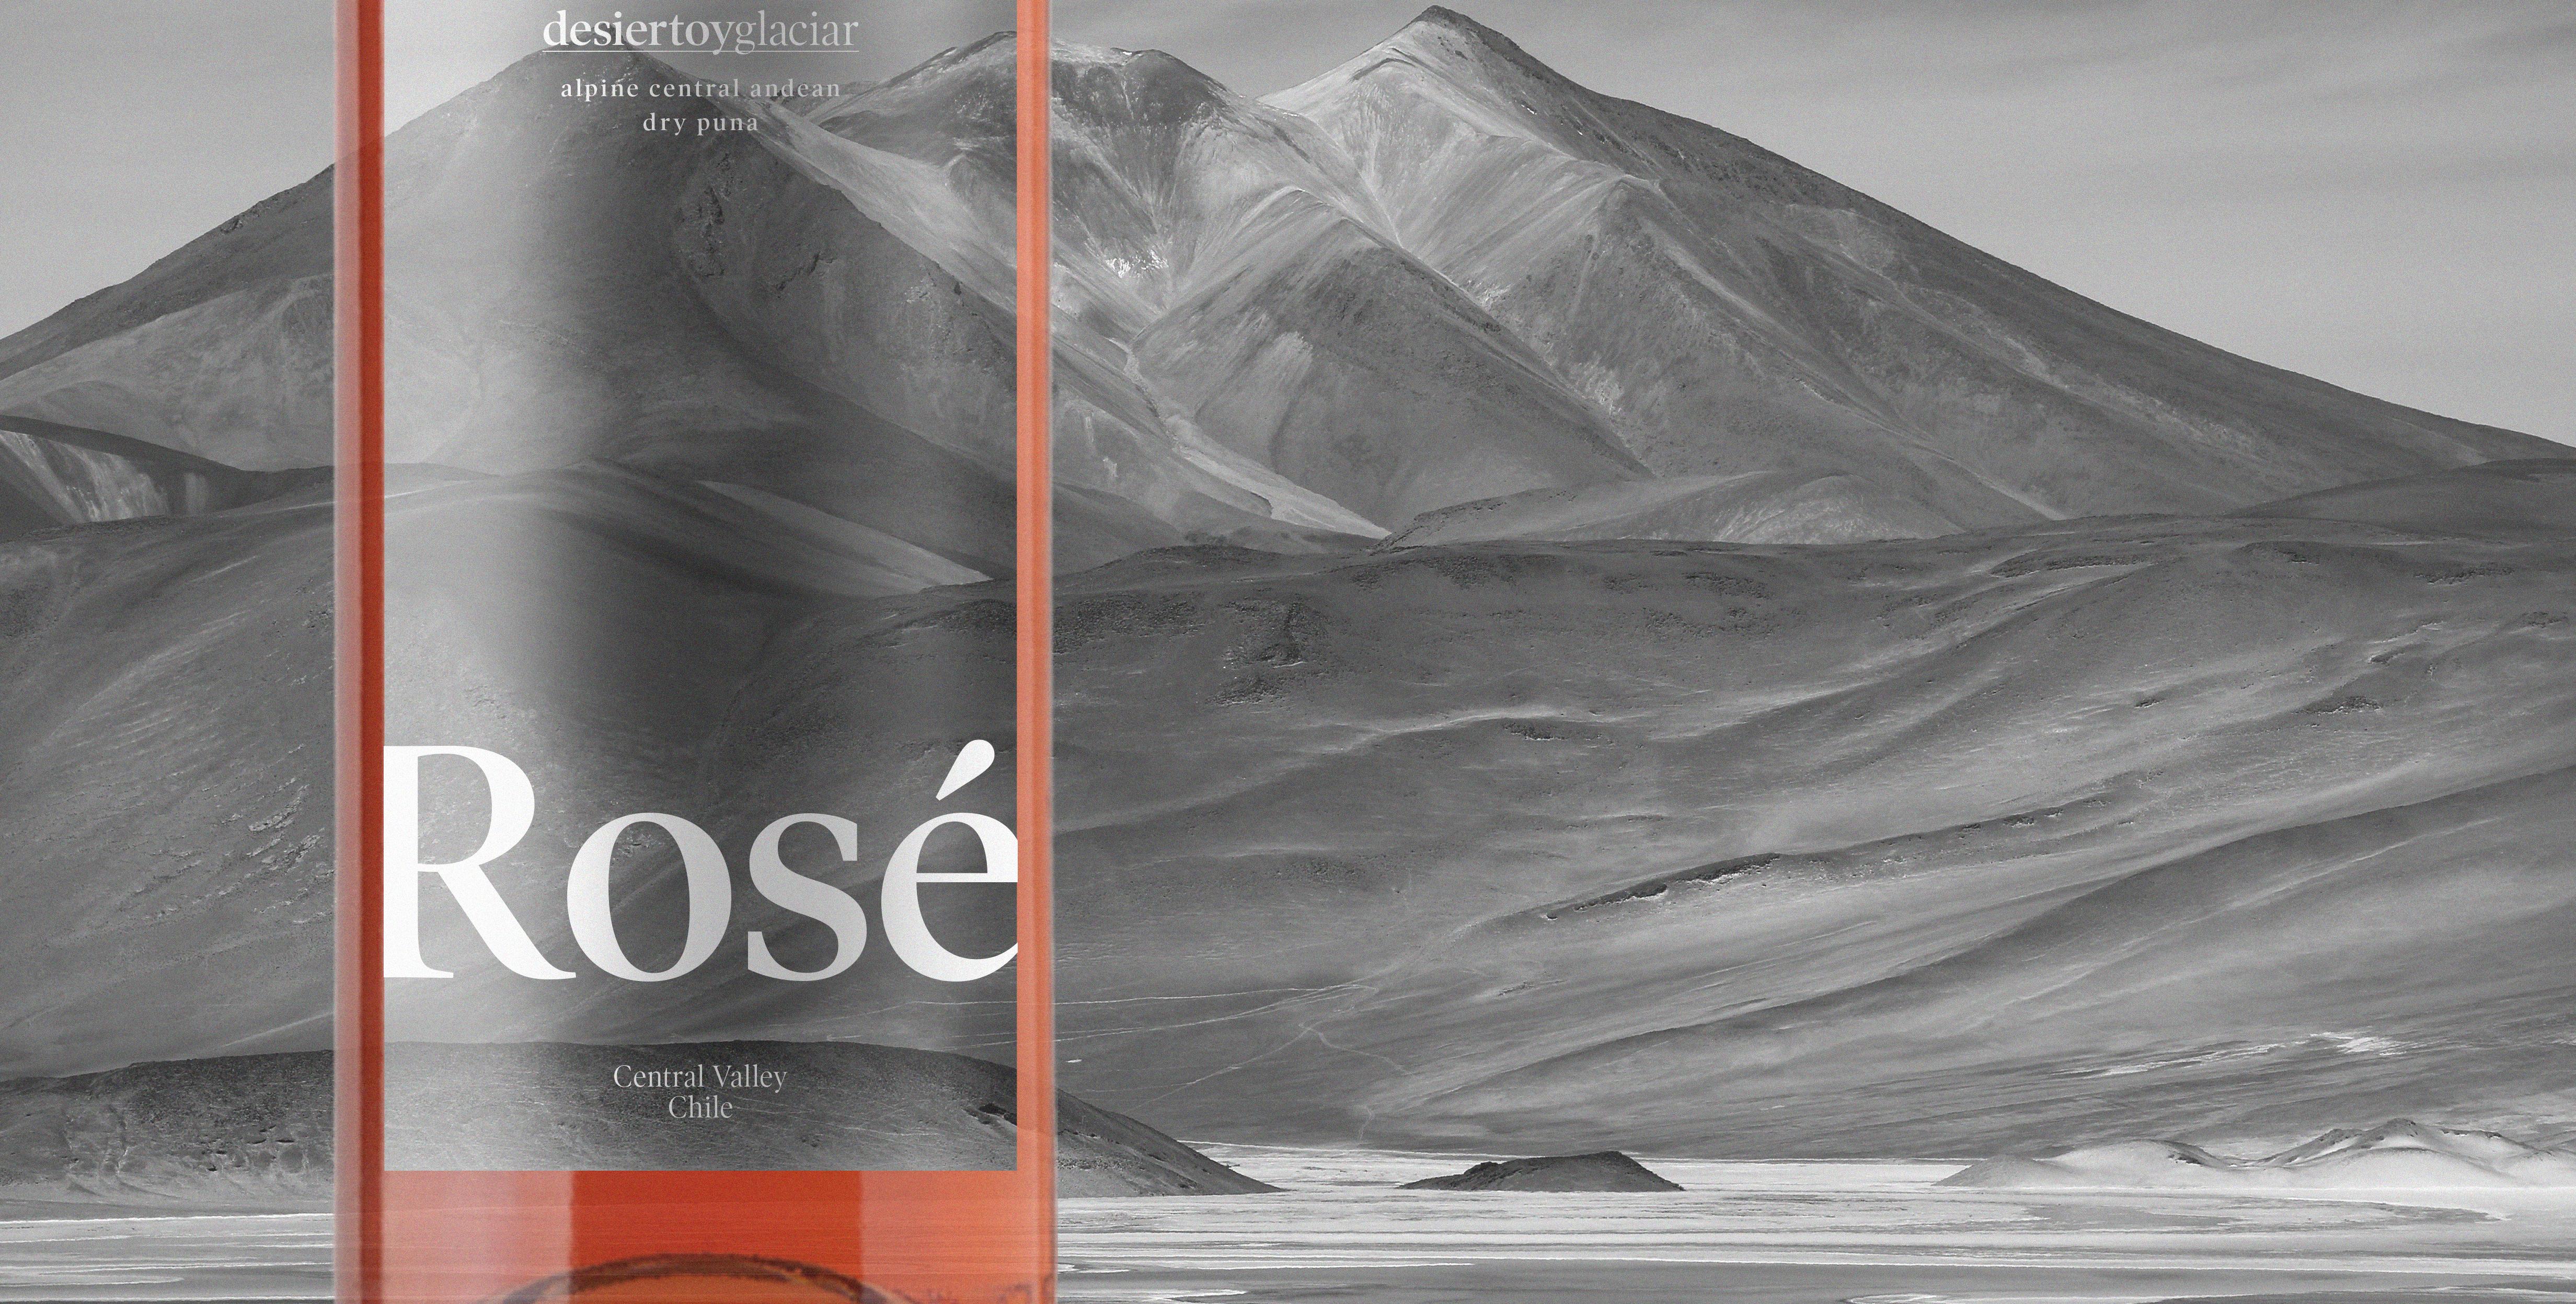 desiertoyglaciar_mockup_0002_Rose